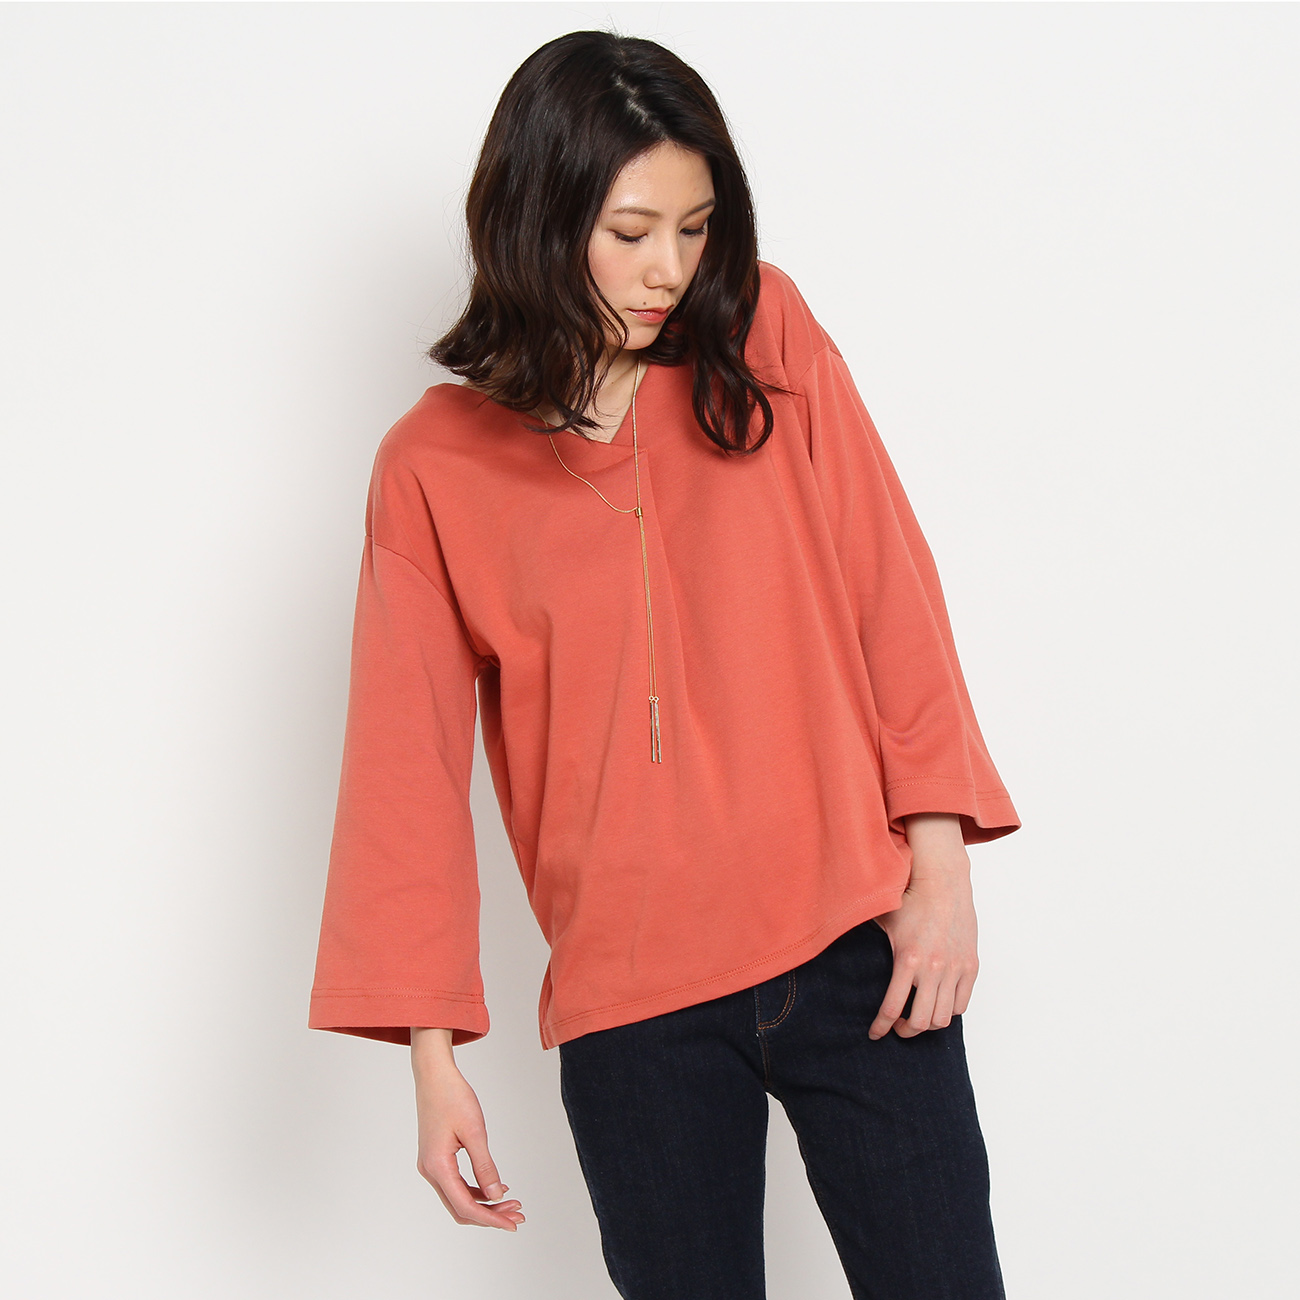 【THE SHOP TK(Ladies) (ザ ショップ ティーケー(レディース))】吸水速乾重ねVポンチプルオーバーレディース トップス カットソー・Tシャツ オレンジ